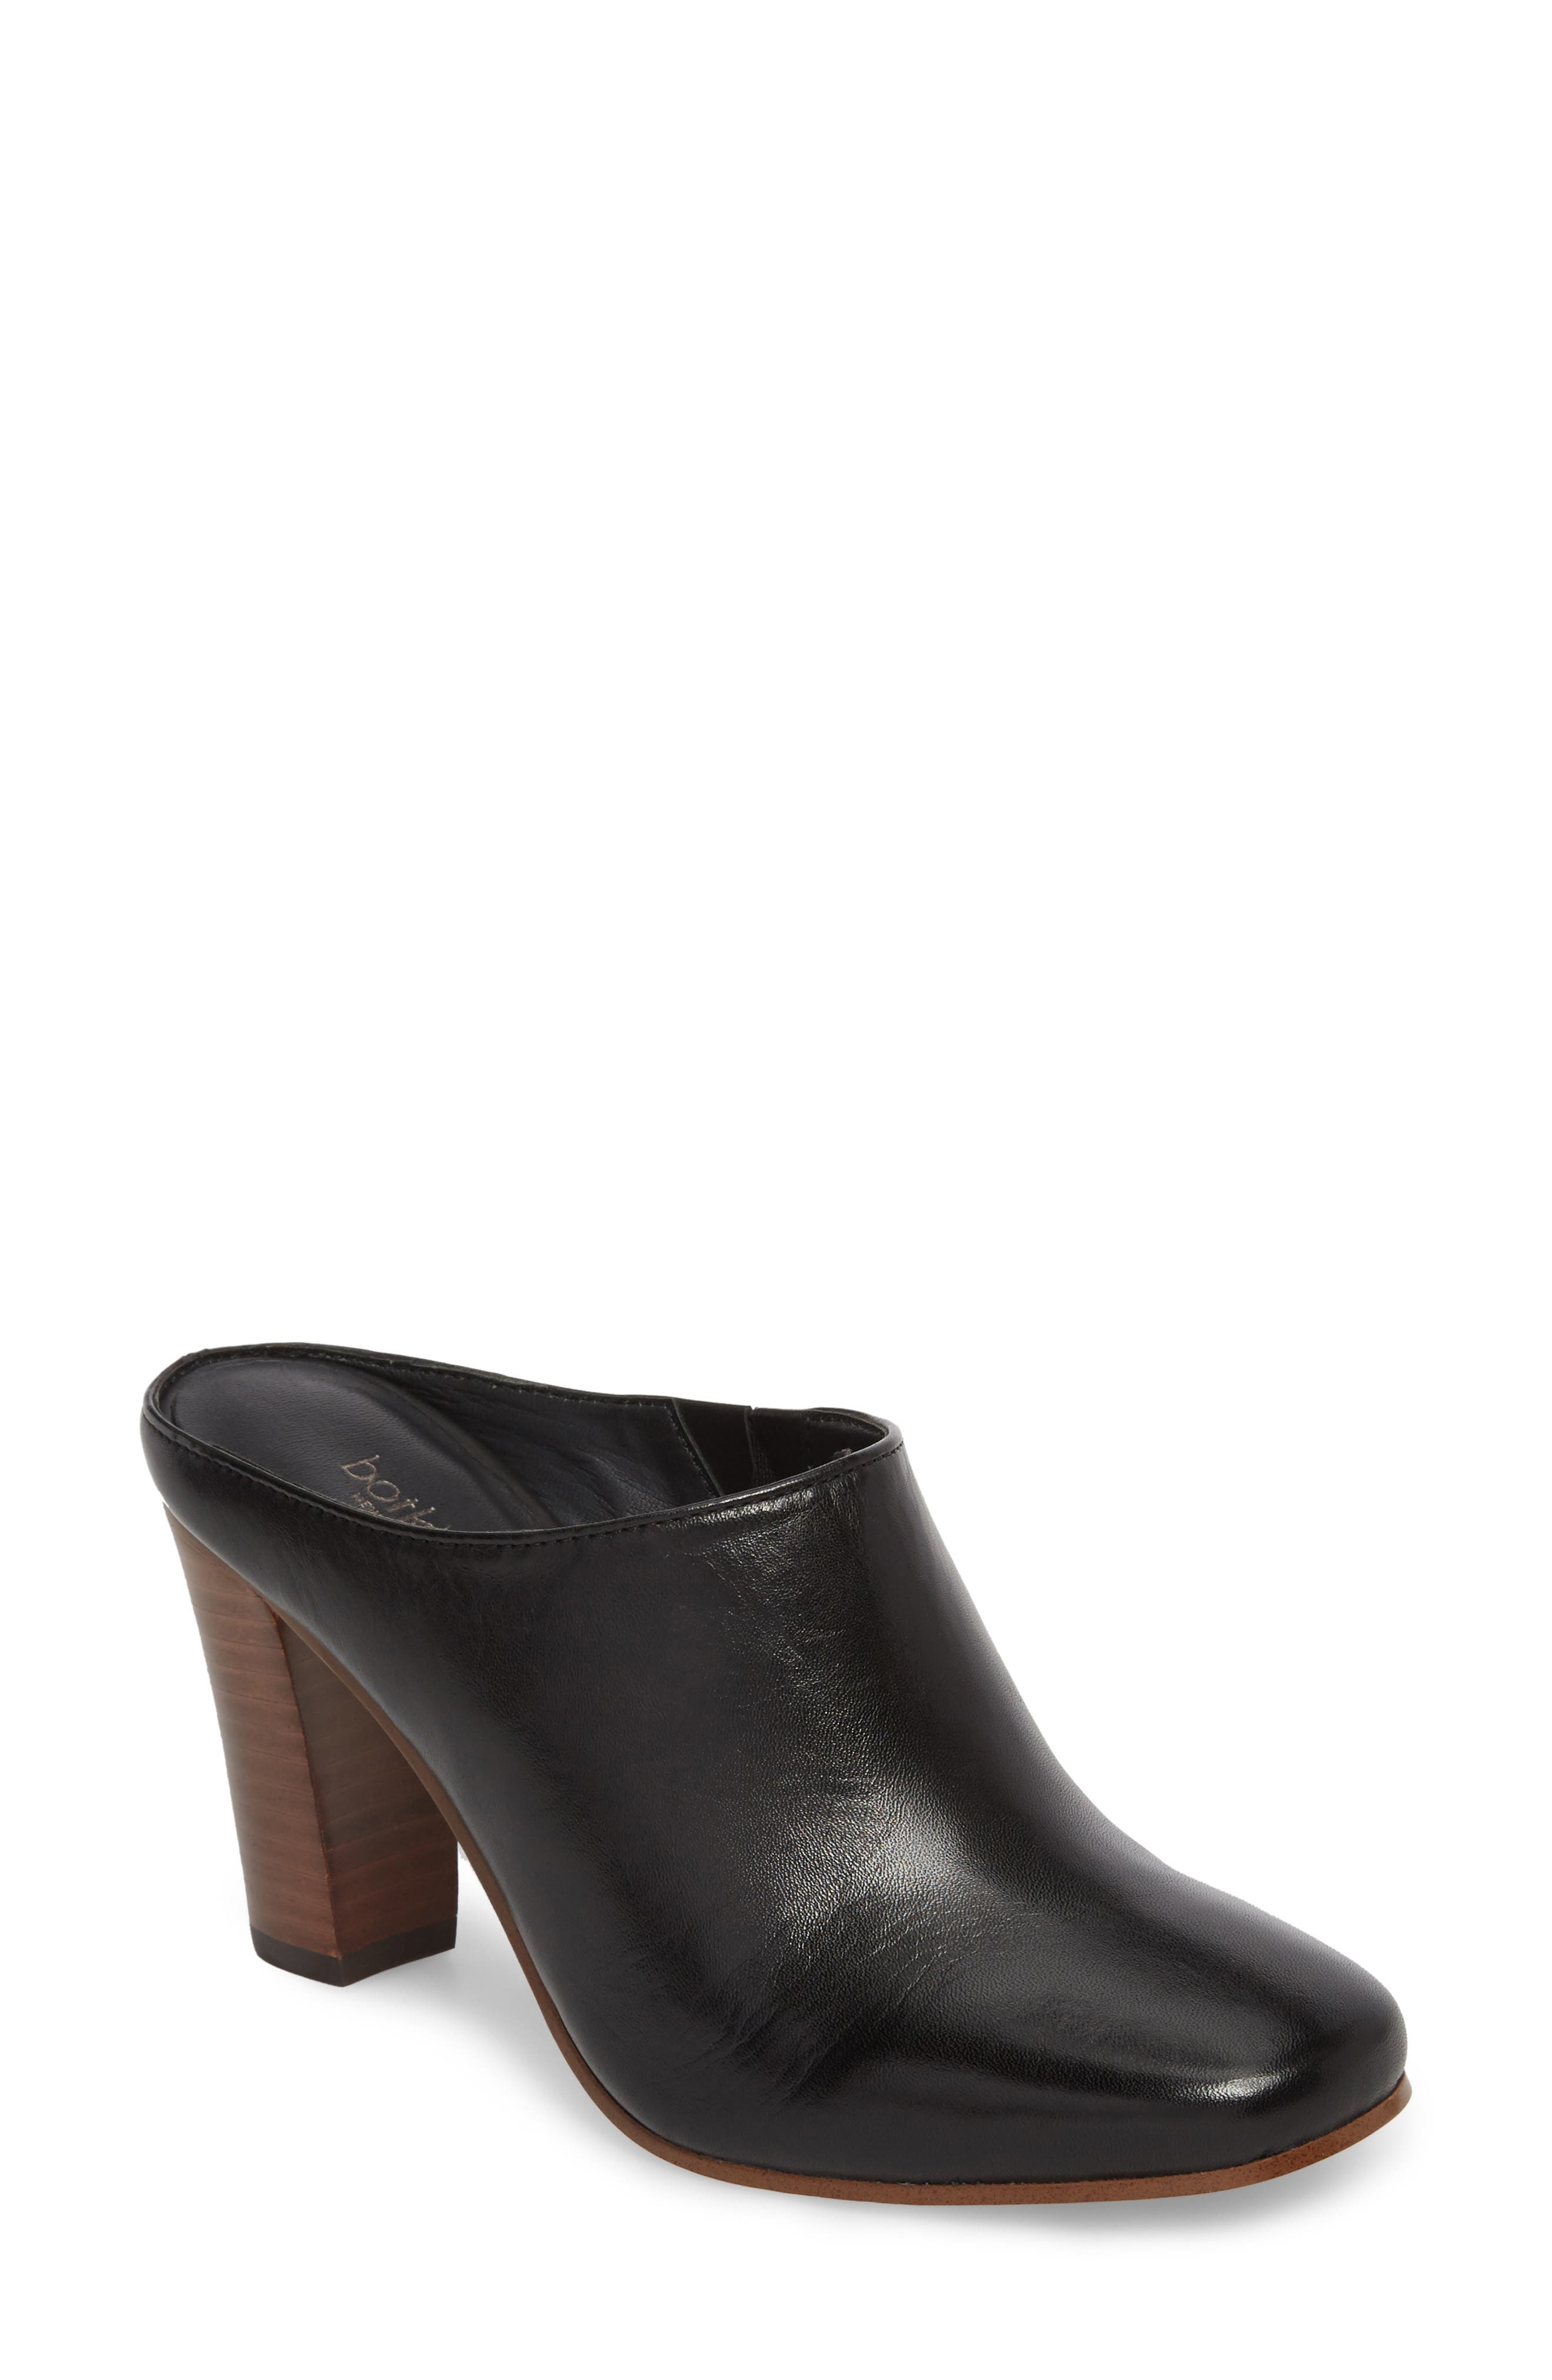 Sherry Mule,                             Main thumbnail 1, color,                             Black Nappa Leather